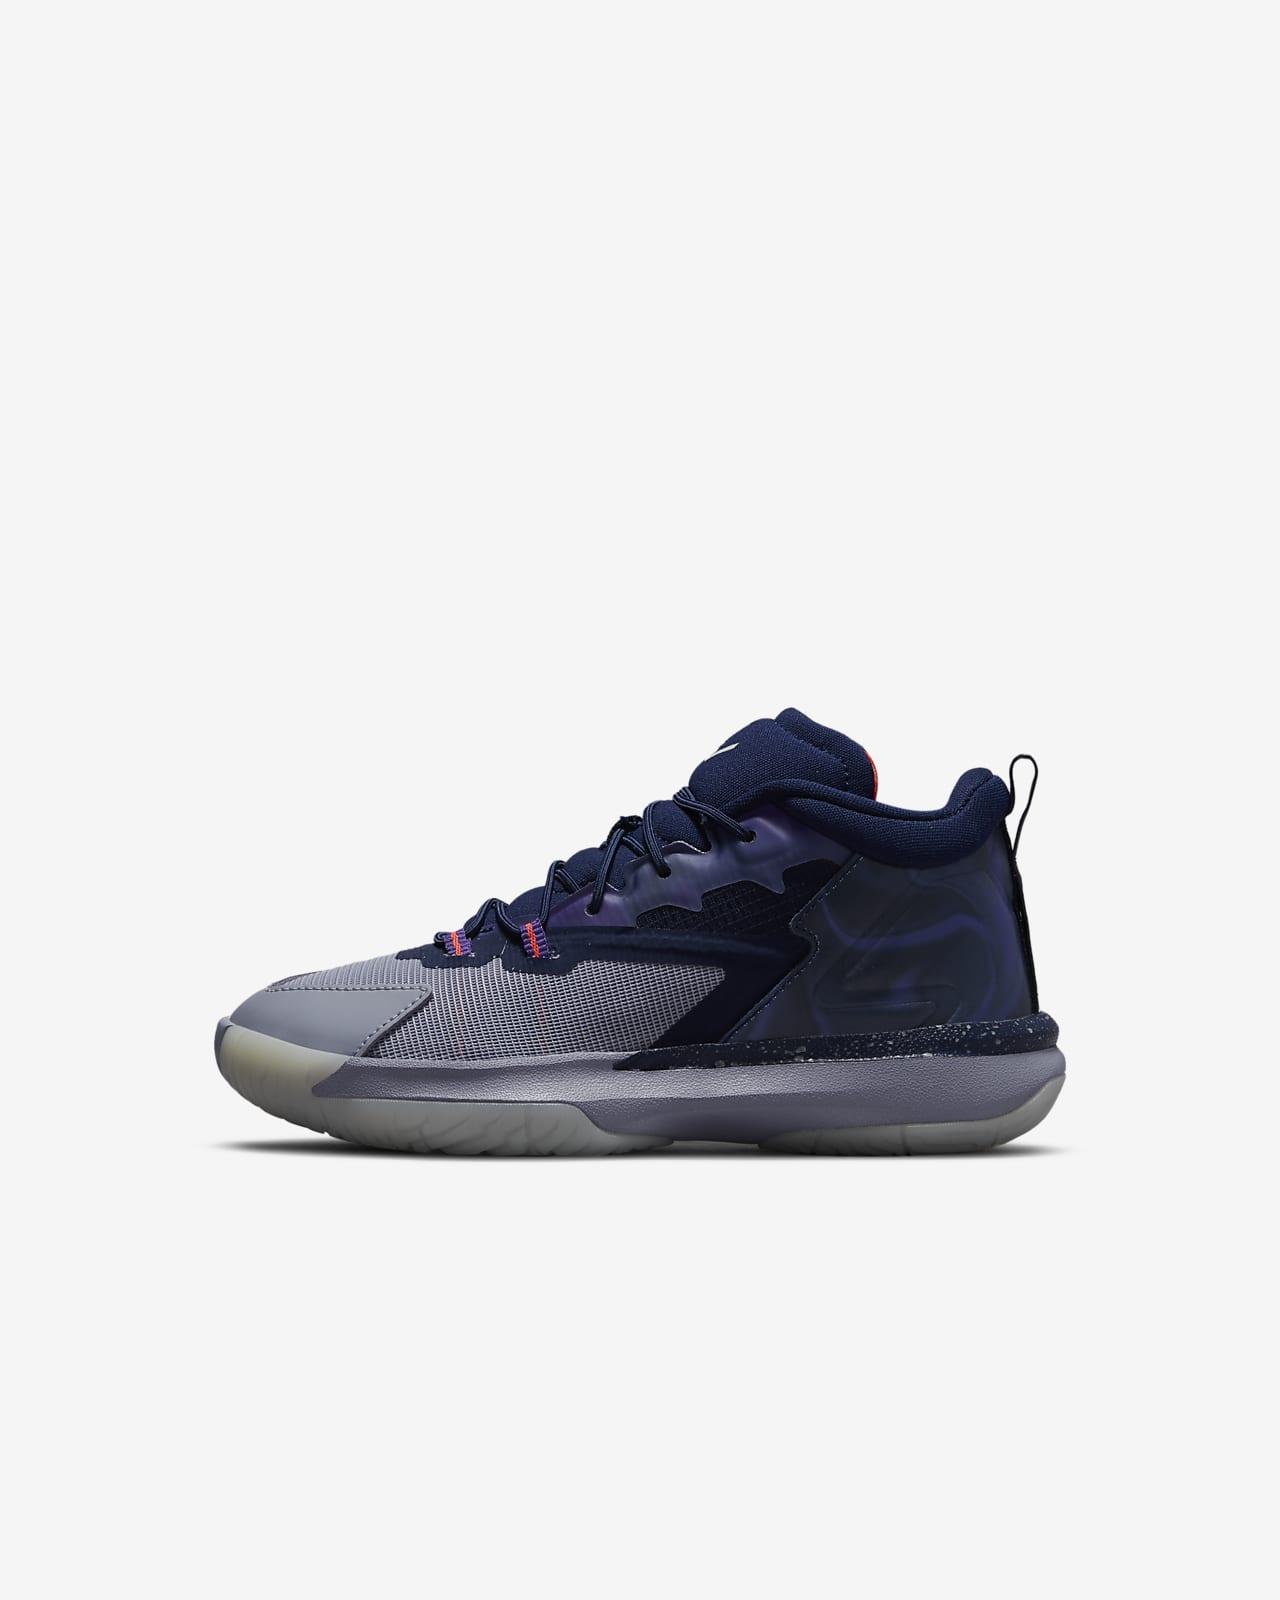 Jordan Zion 1 (PS) 幼童运动童鞋